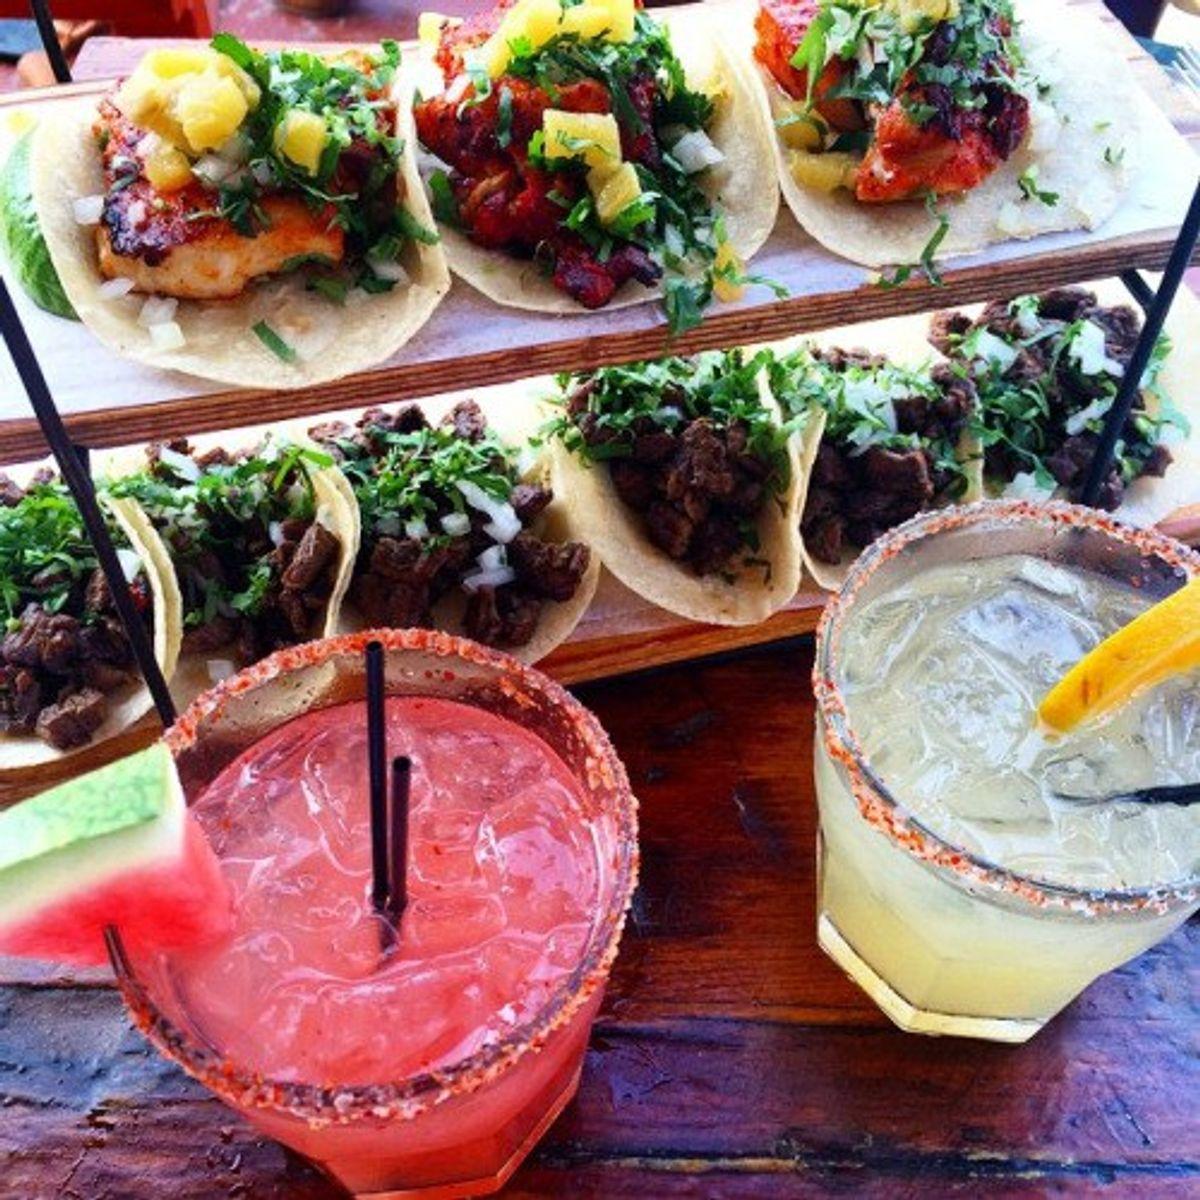 Top 10 Insta-worthy Spots in Santa Monica